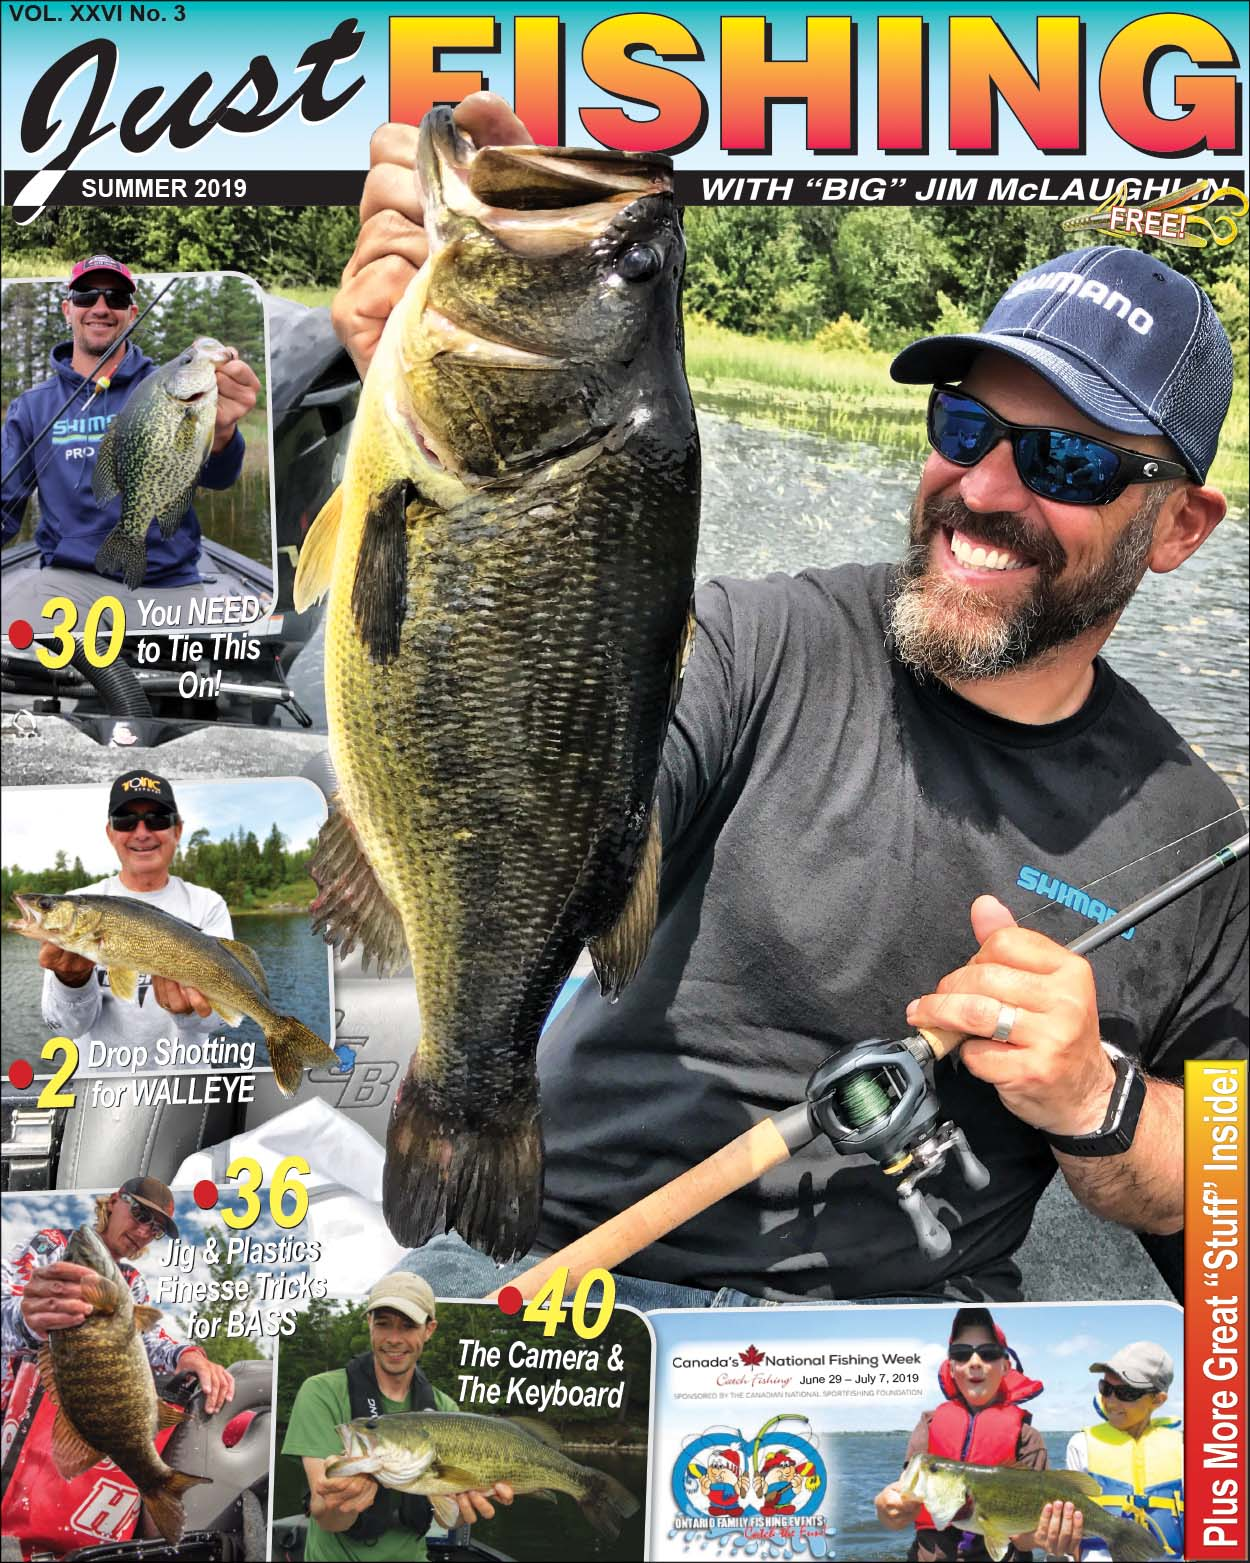 Just Fishing Summer 2019